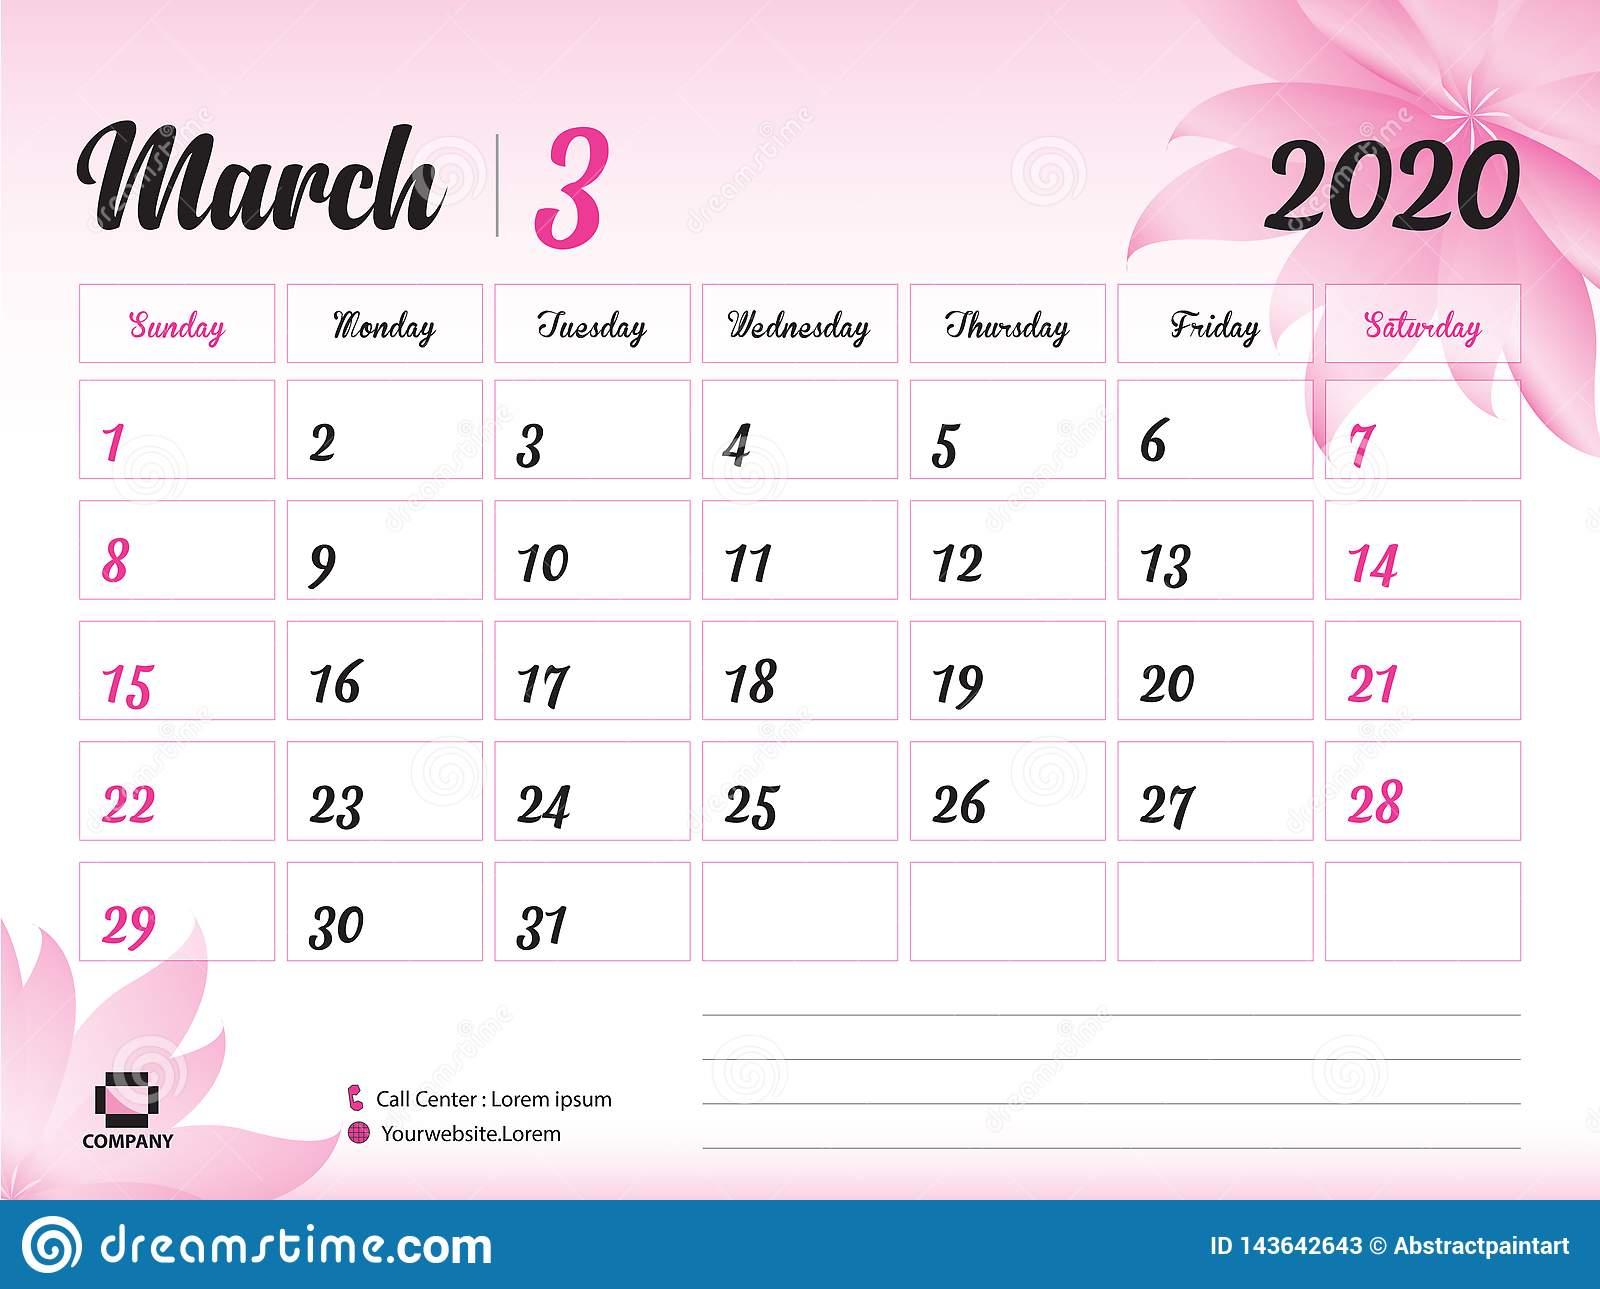 March 2020 Year Template, Calendar 2020 Vector, Desk